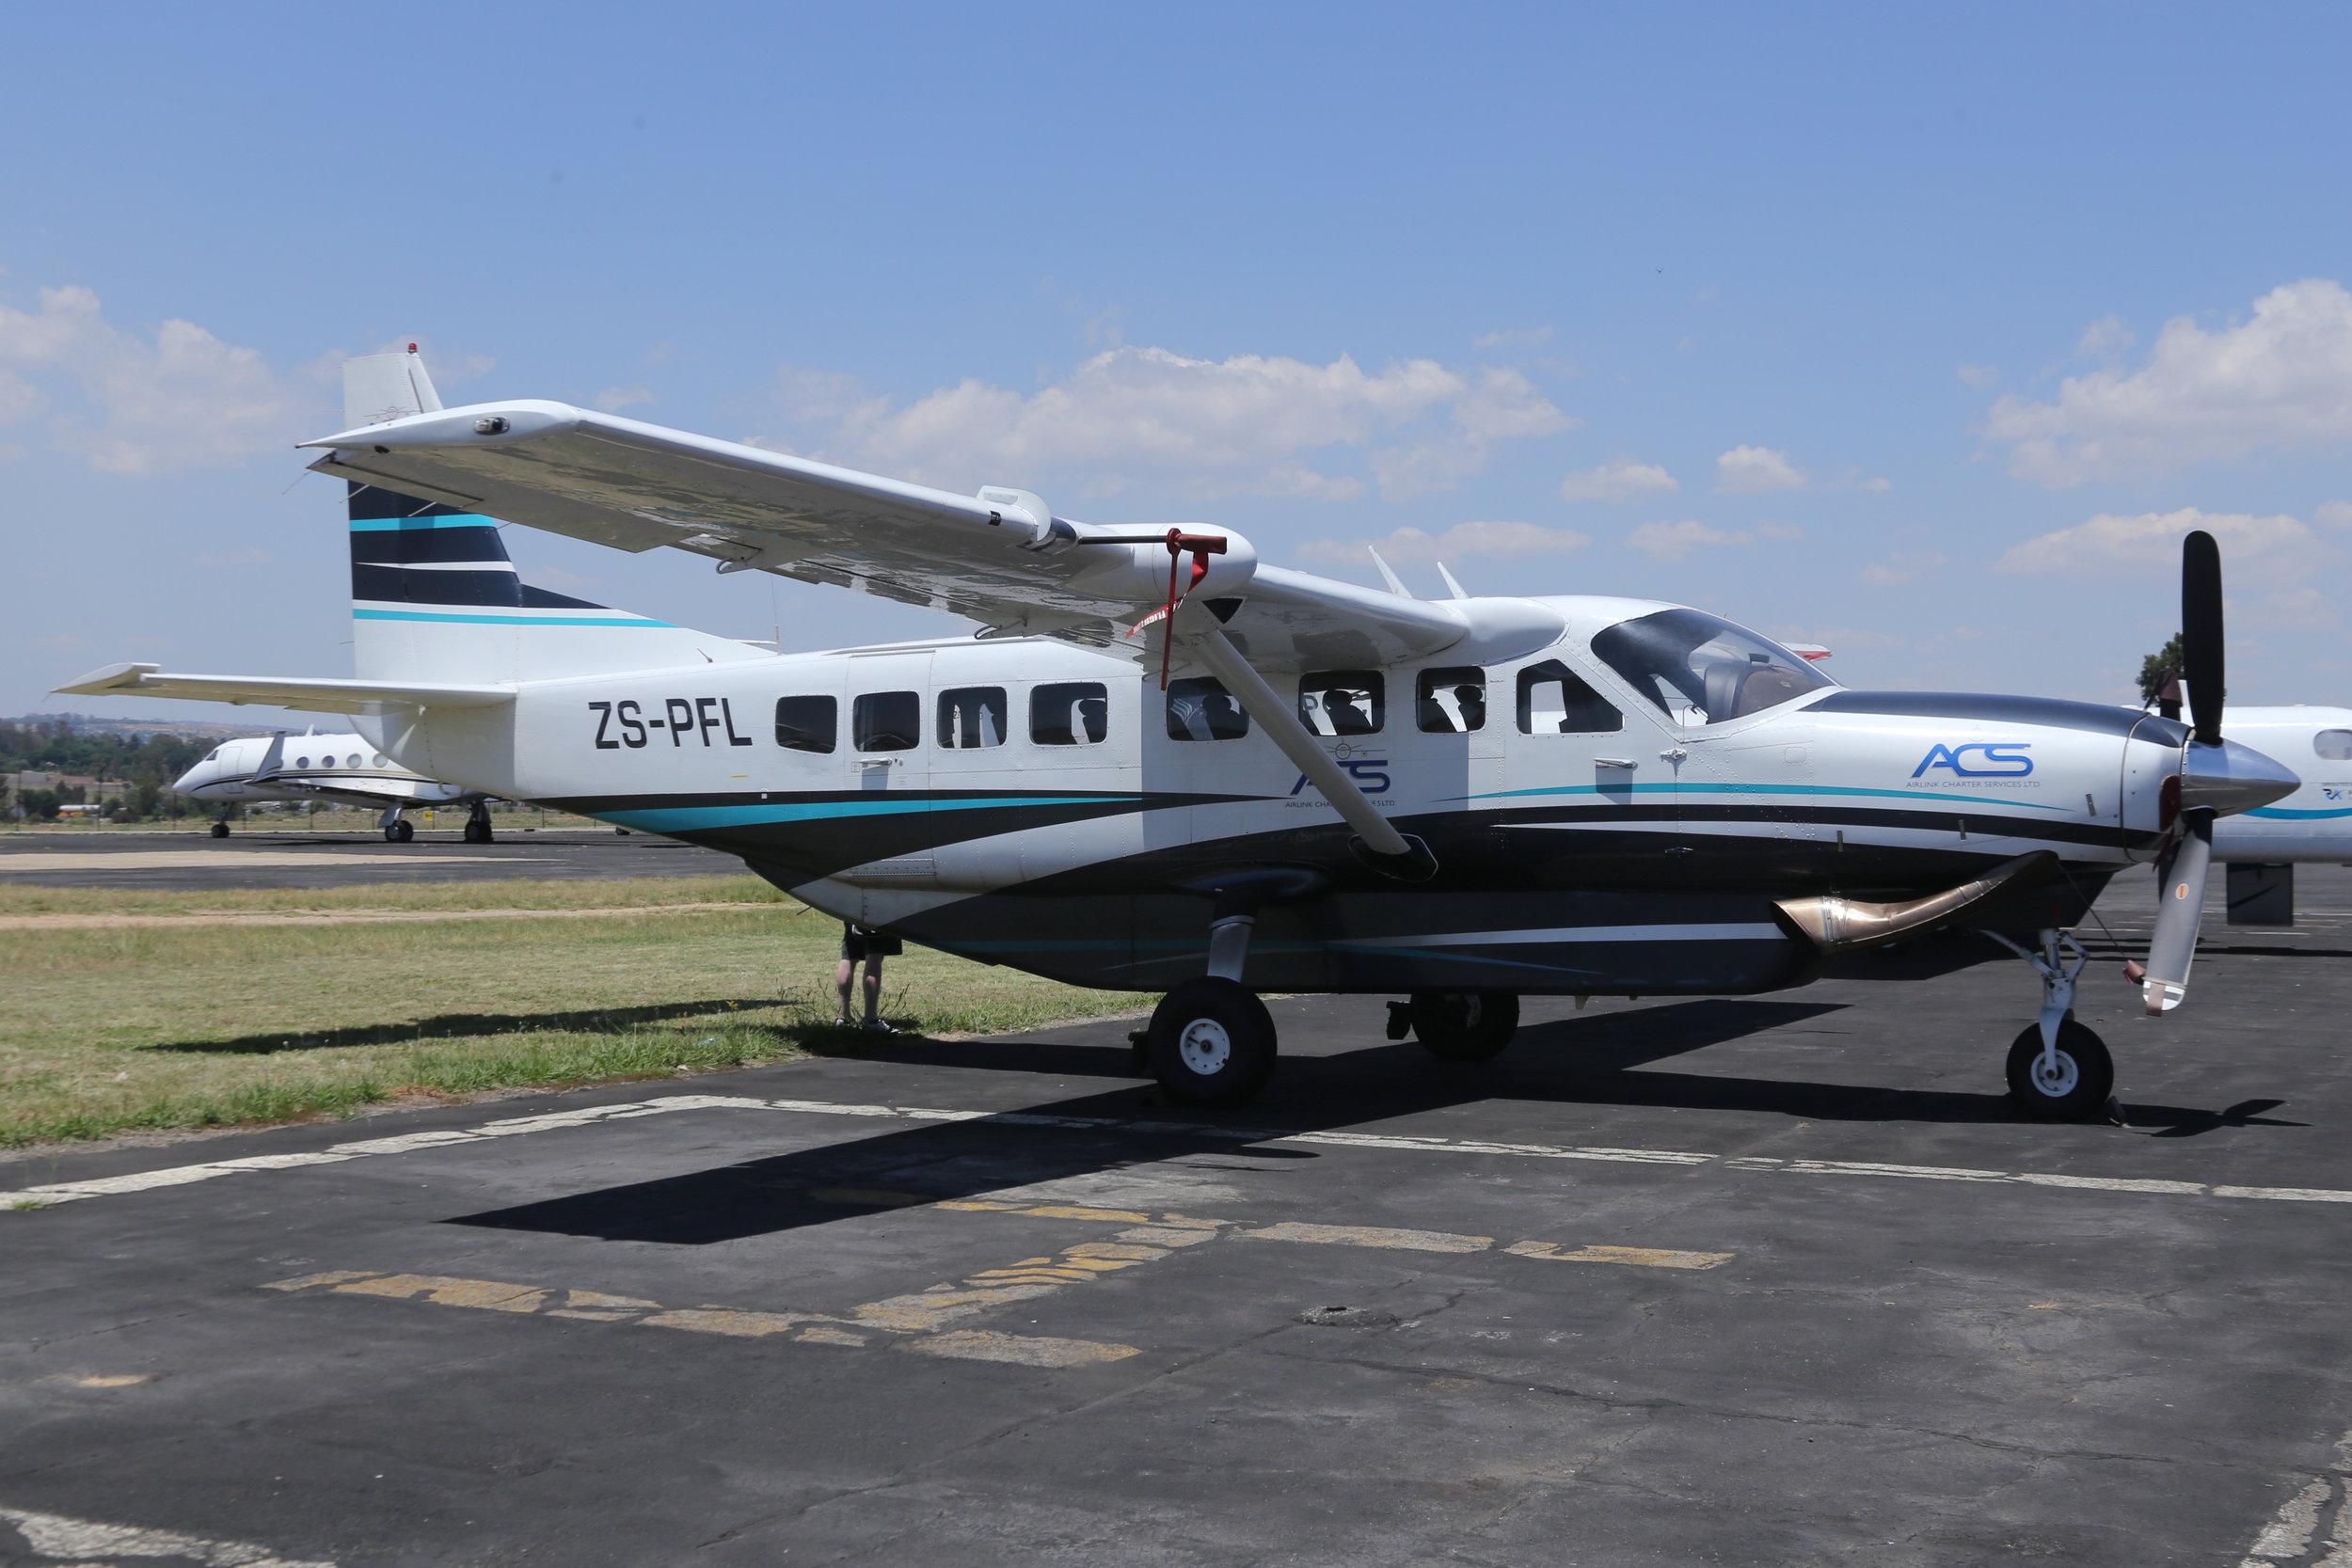 ZS-PFL ACS Cessna 208 taken at Lanseria 9th November 2018 by John Wood